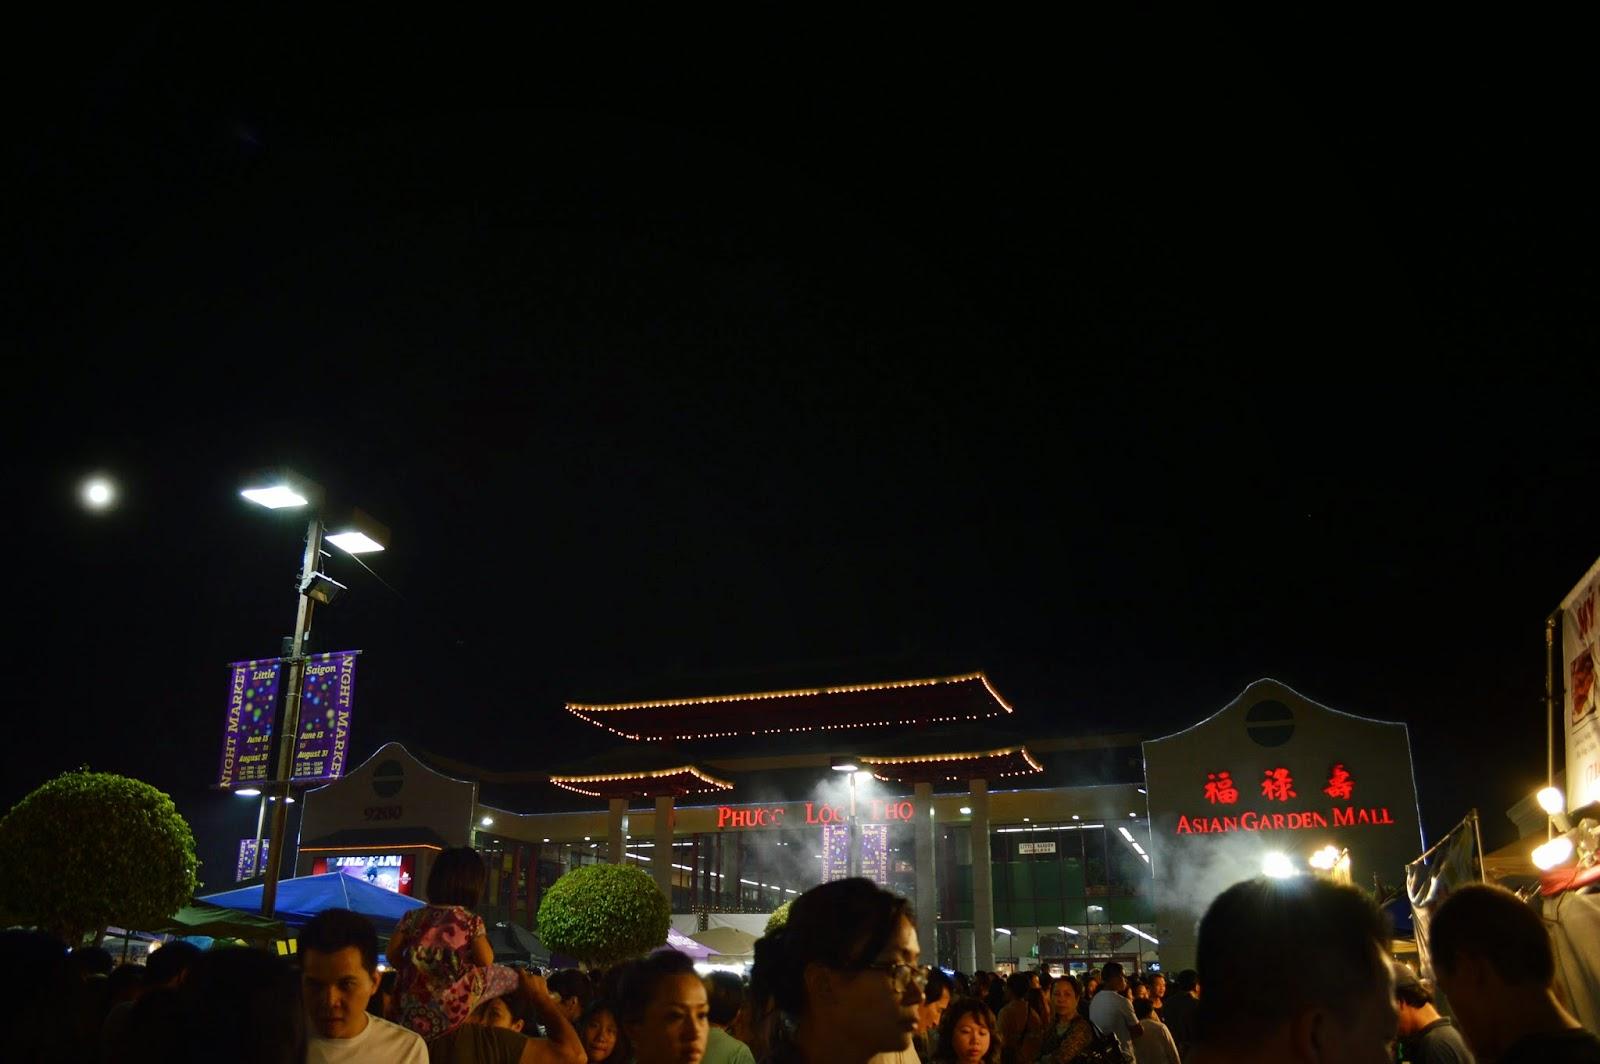 2014 Asian Garden Mall Night Market Westminster Phuoc